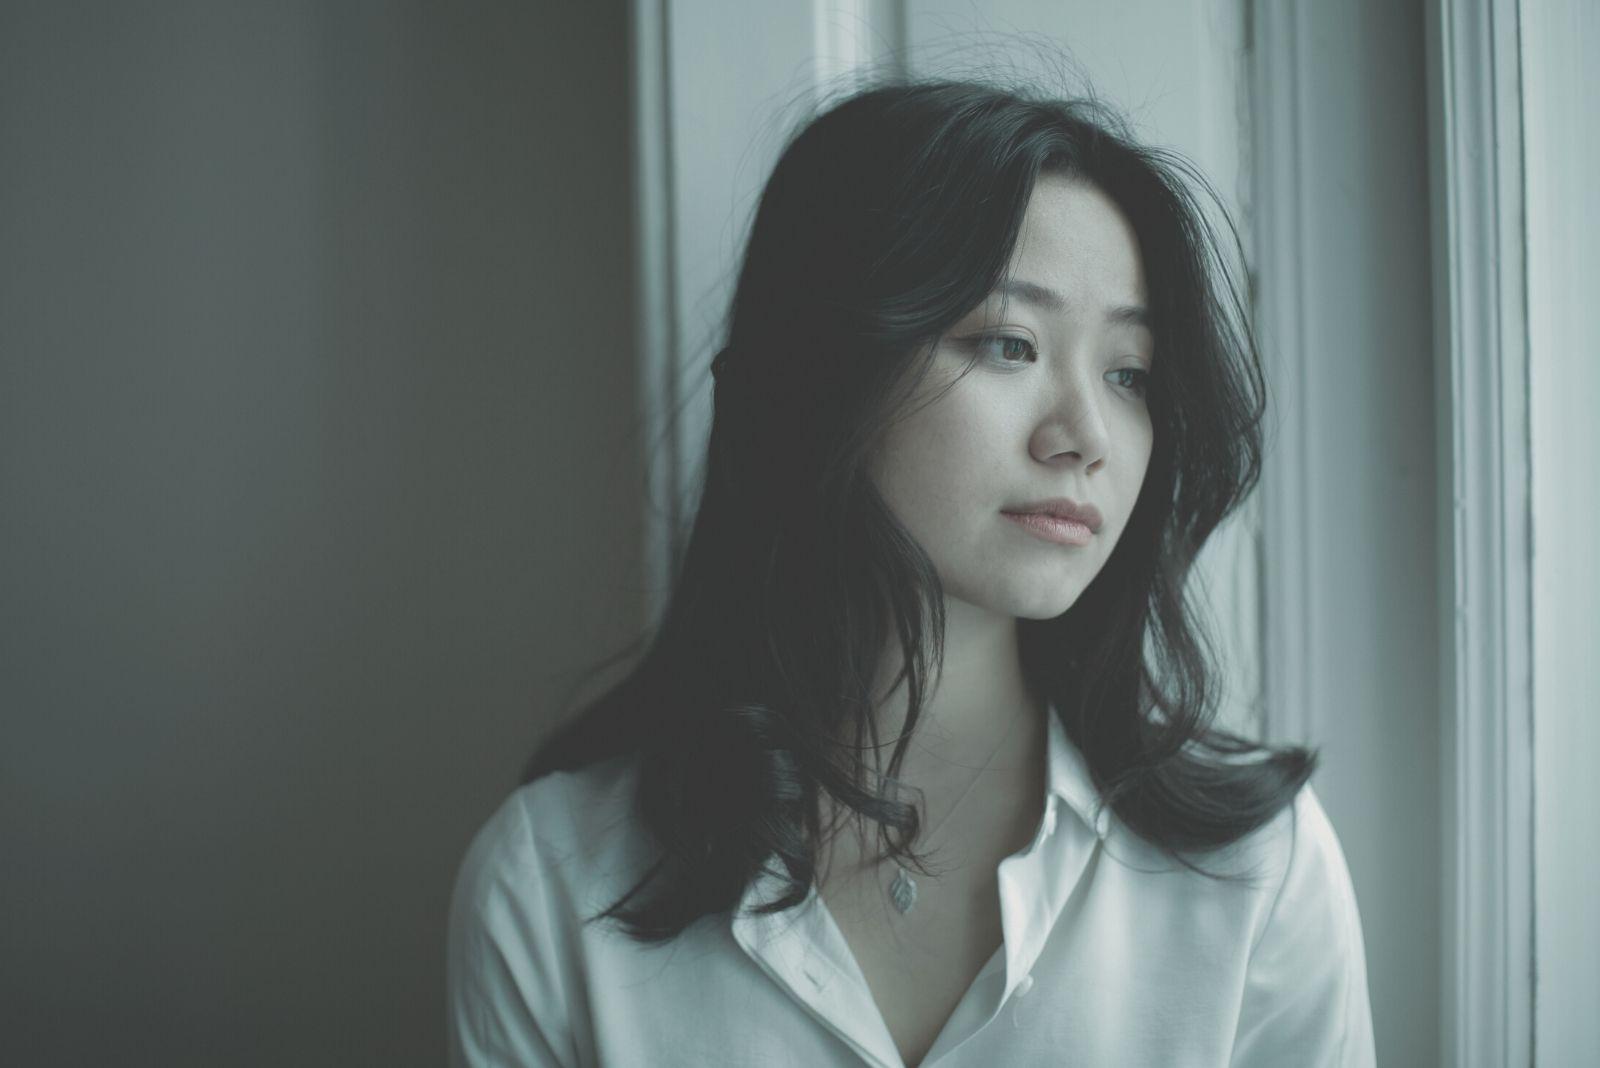 sad pensive woman looking outside thru the window wearing white top